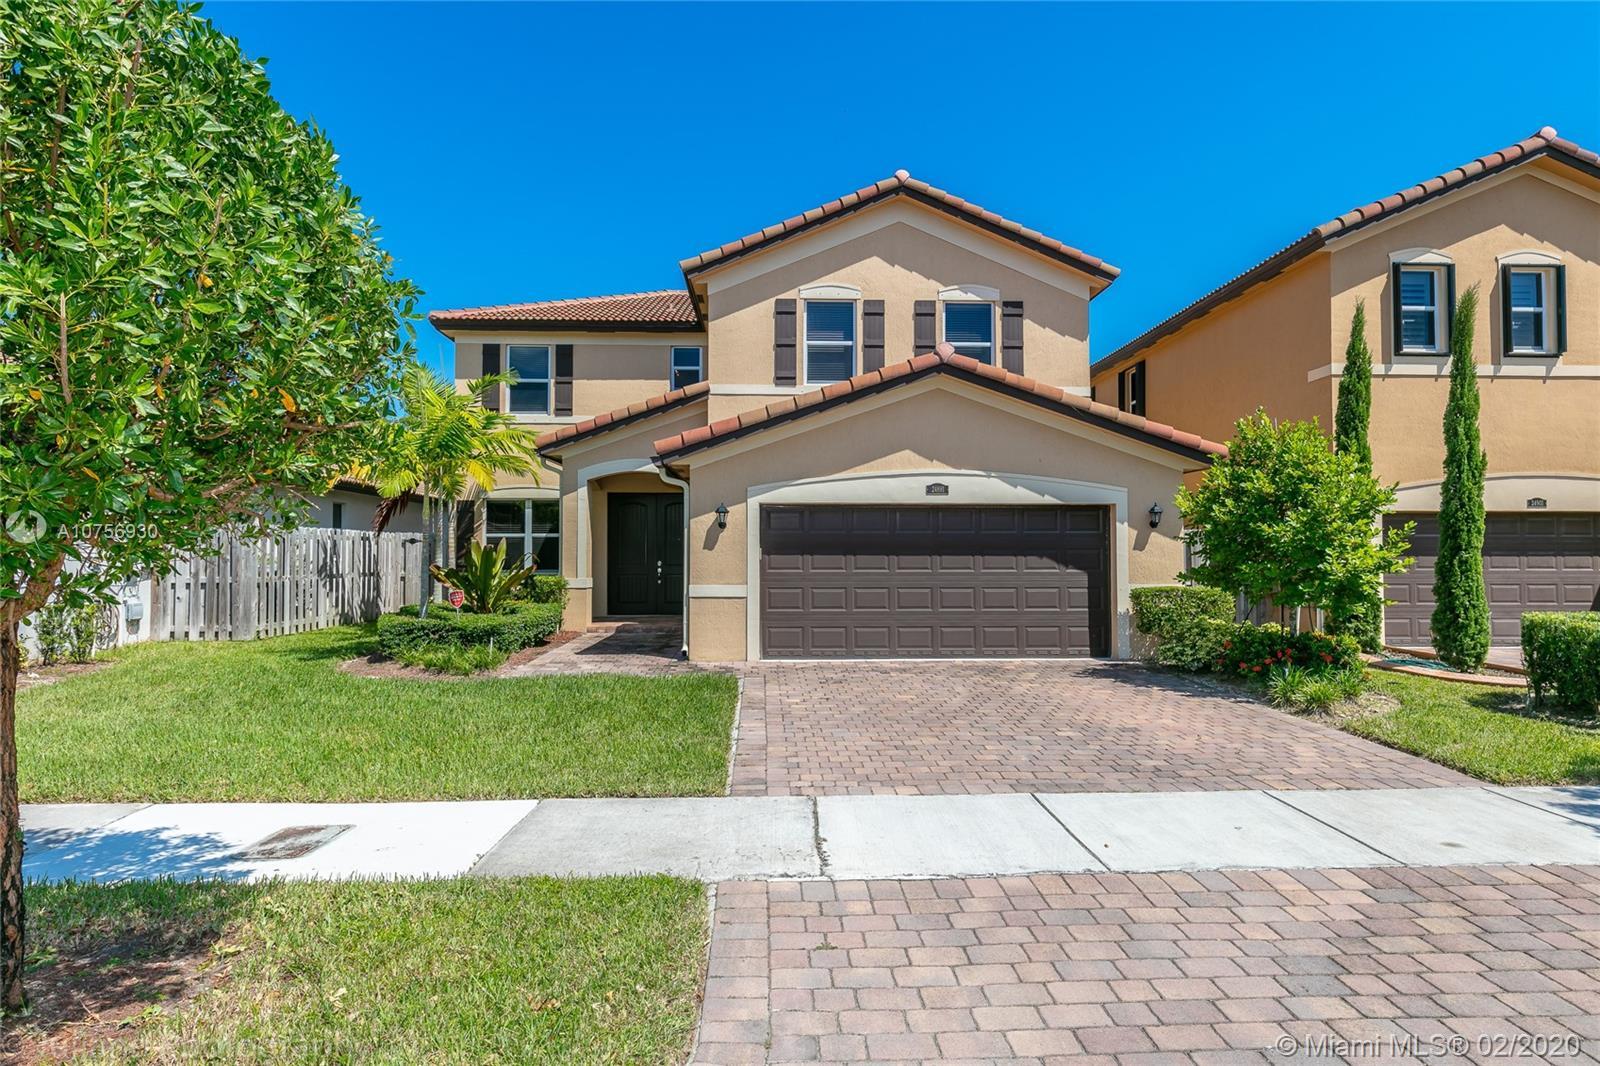 24881 SW 118th Ct, Homestead, FL 33032 - Homestead, FL real estate listing